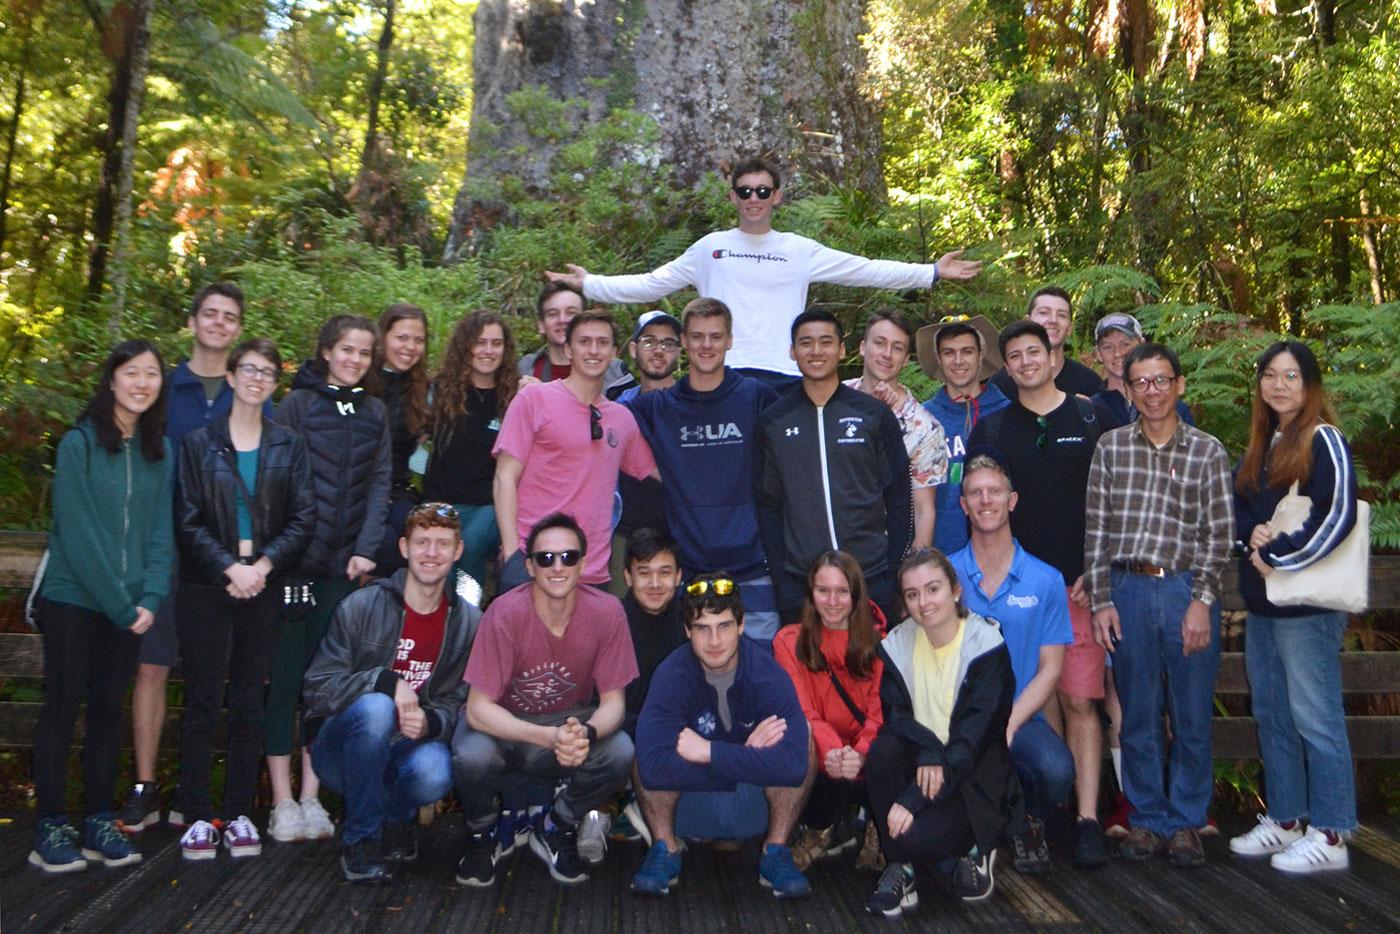 New-Zealand-Gap-Year-Adventure-Tane-Mahuta-Northern-Adventure-Tour-New-Zeland-Adventure-Tours-NZ-Tours-&-Travel-Kiwi-Small-Group-Tours-Gap-Year-Tour-in-New-Zeland-Grabatour-Travel